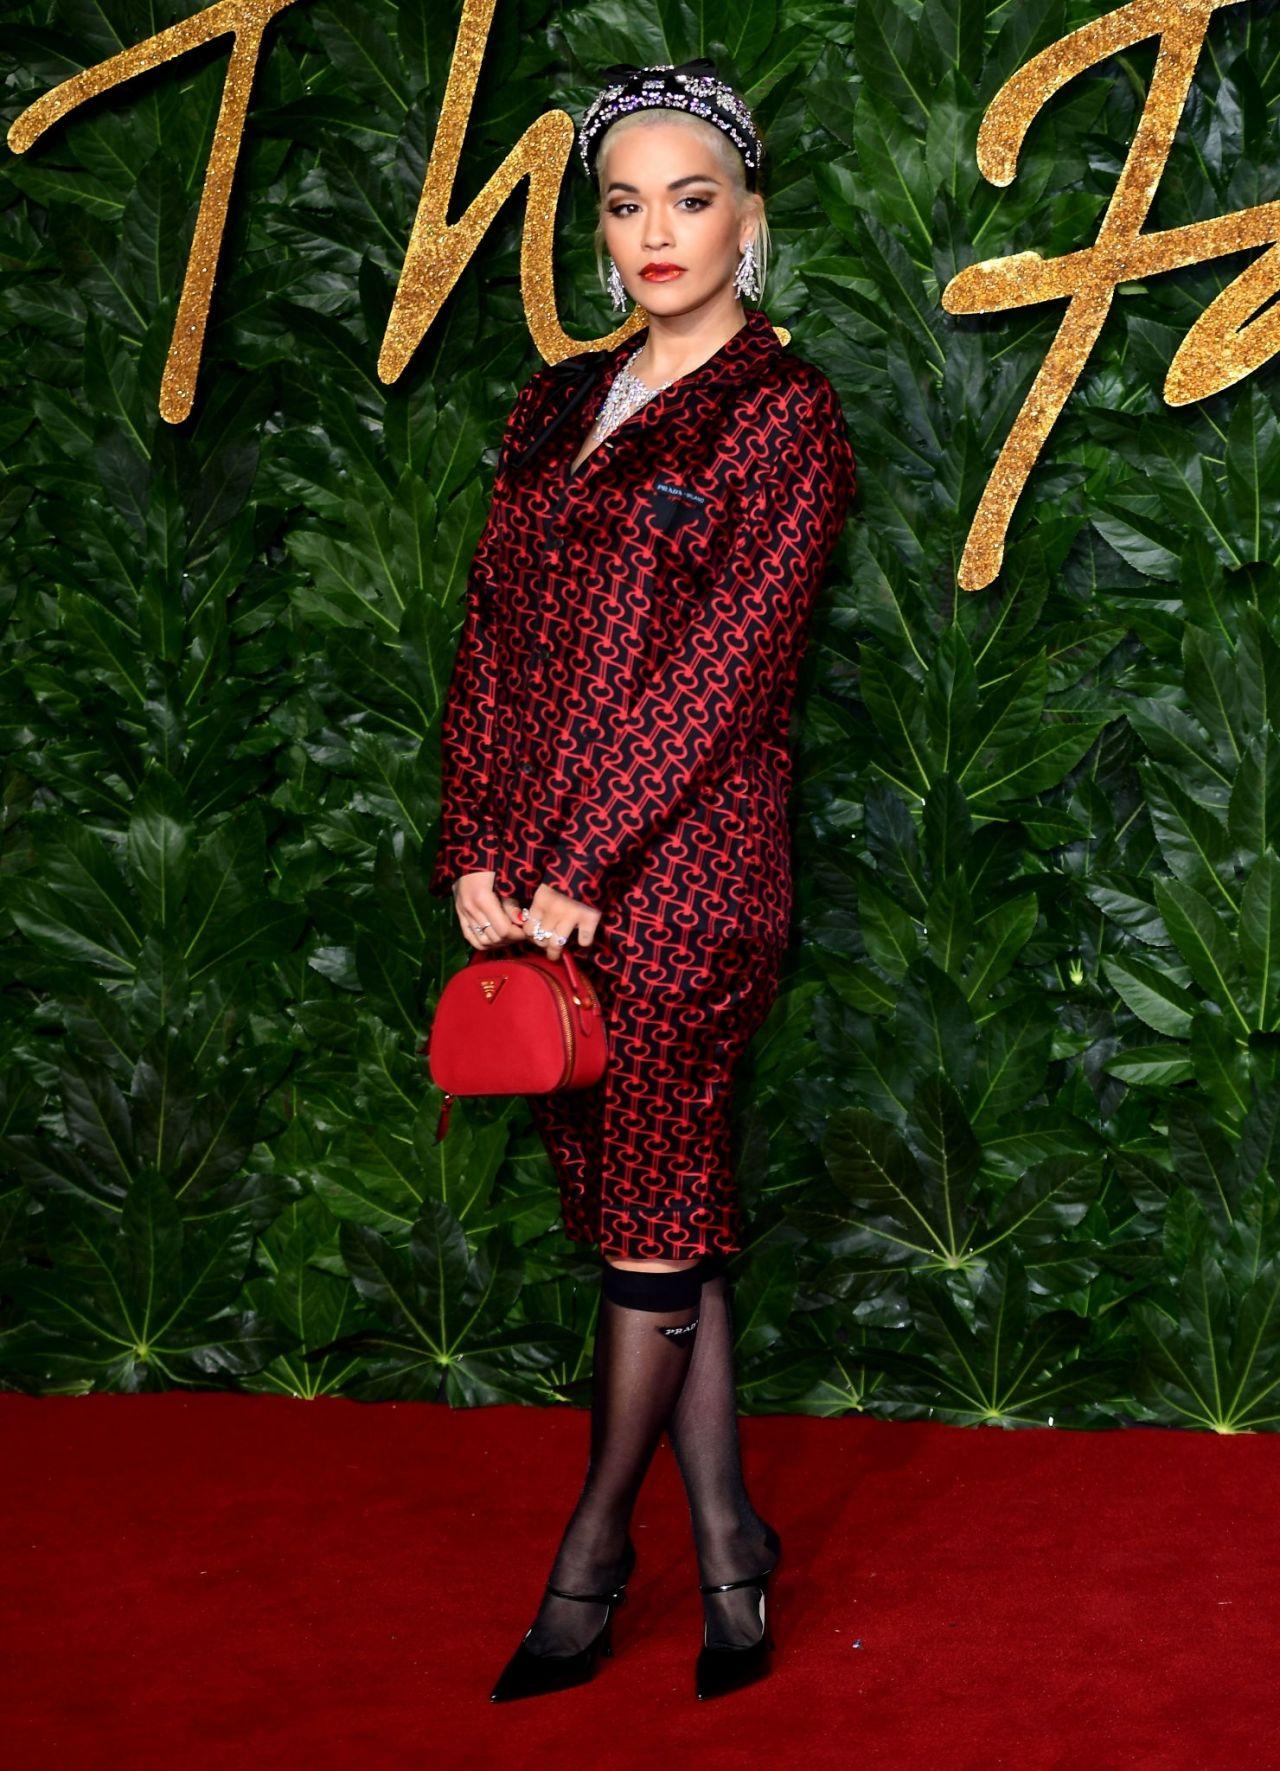 https://celebmafia.com/wp-content/uploads/2018/12/rita-ora-the-fashion-awards-2018-in-london-4.jpg